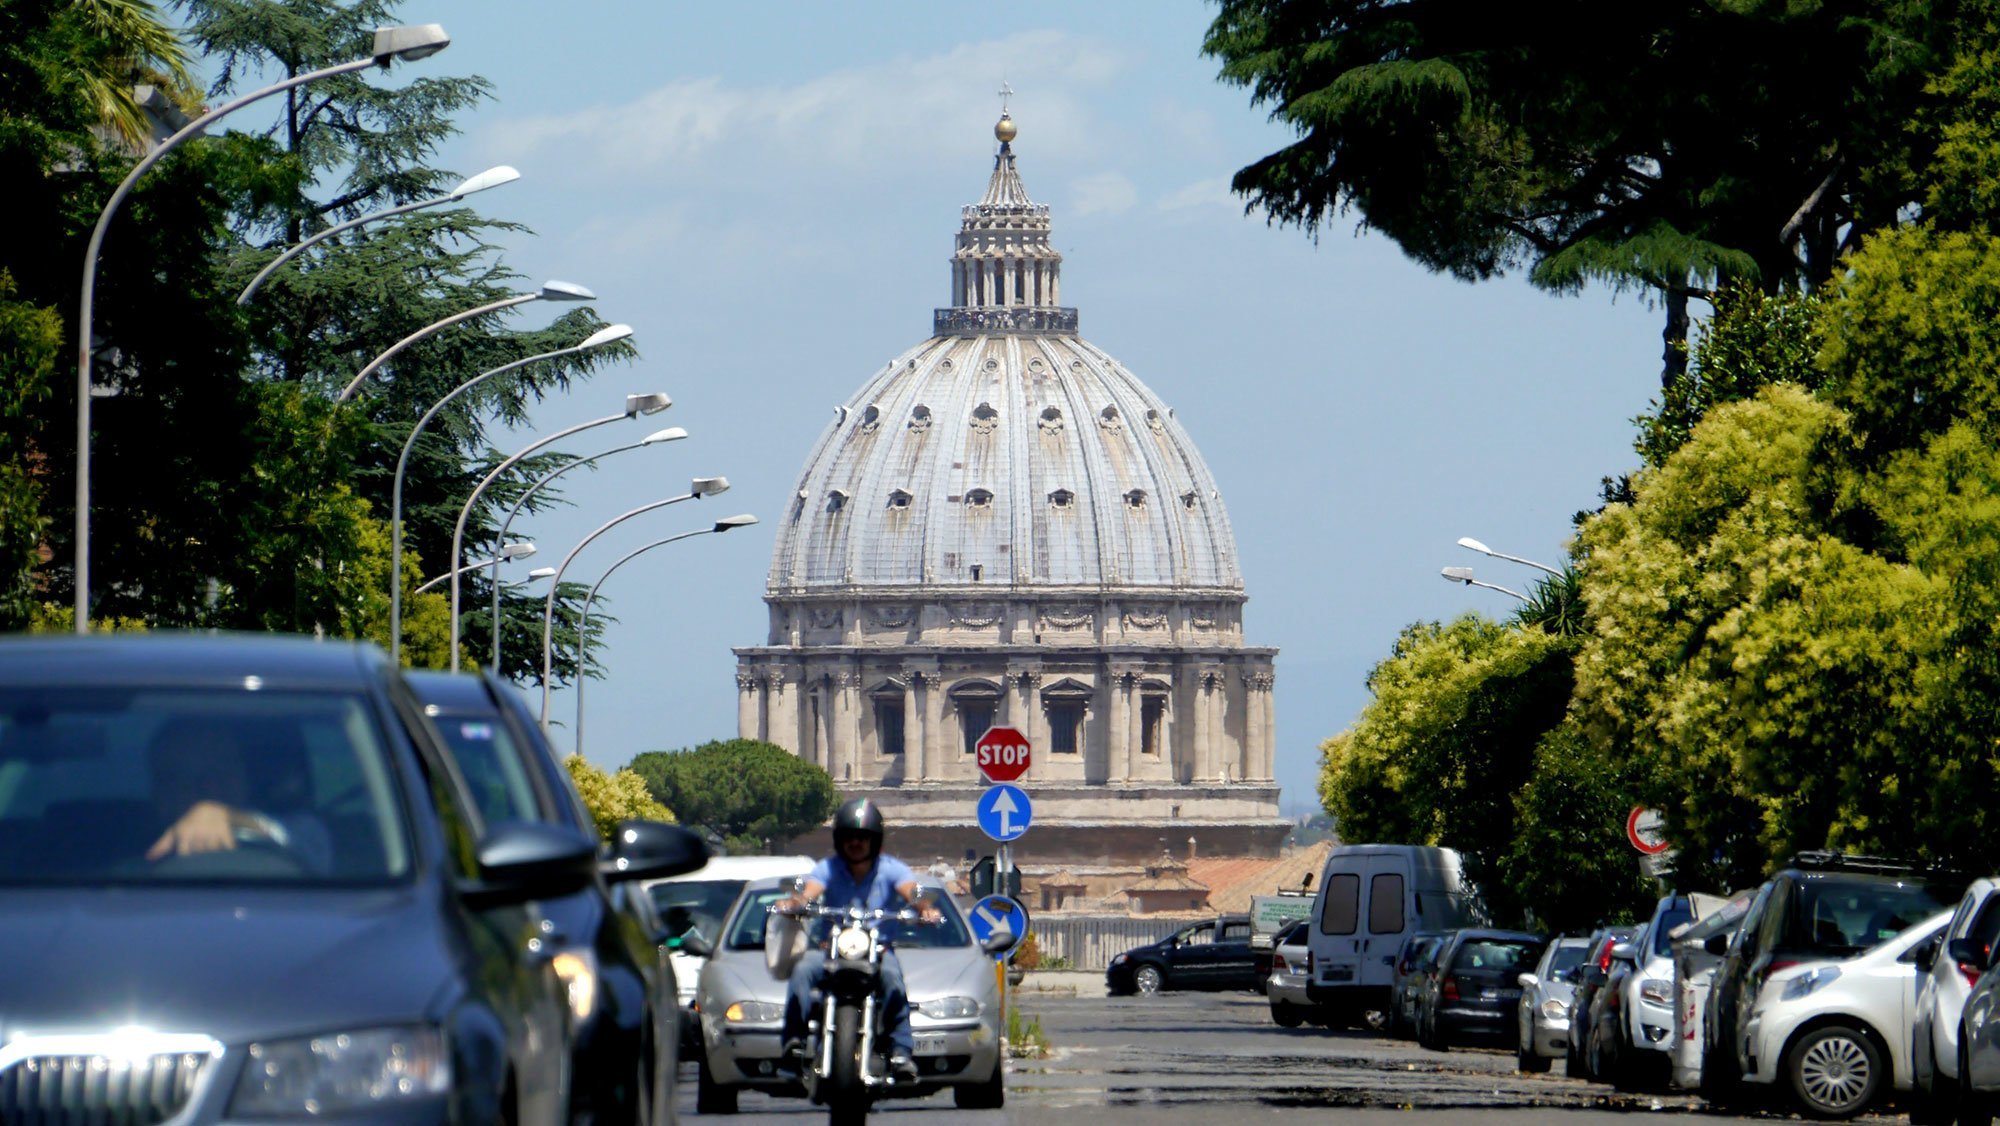 The optical illusion of St Peter's Basilica from Via Niccolò Piccolomini